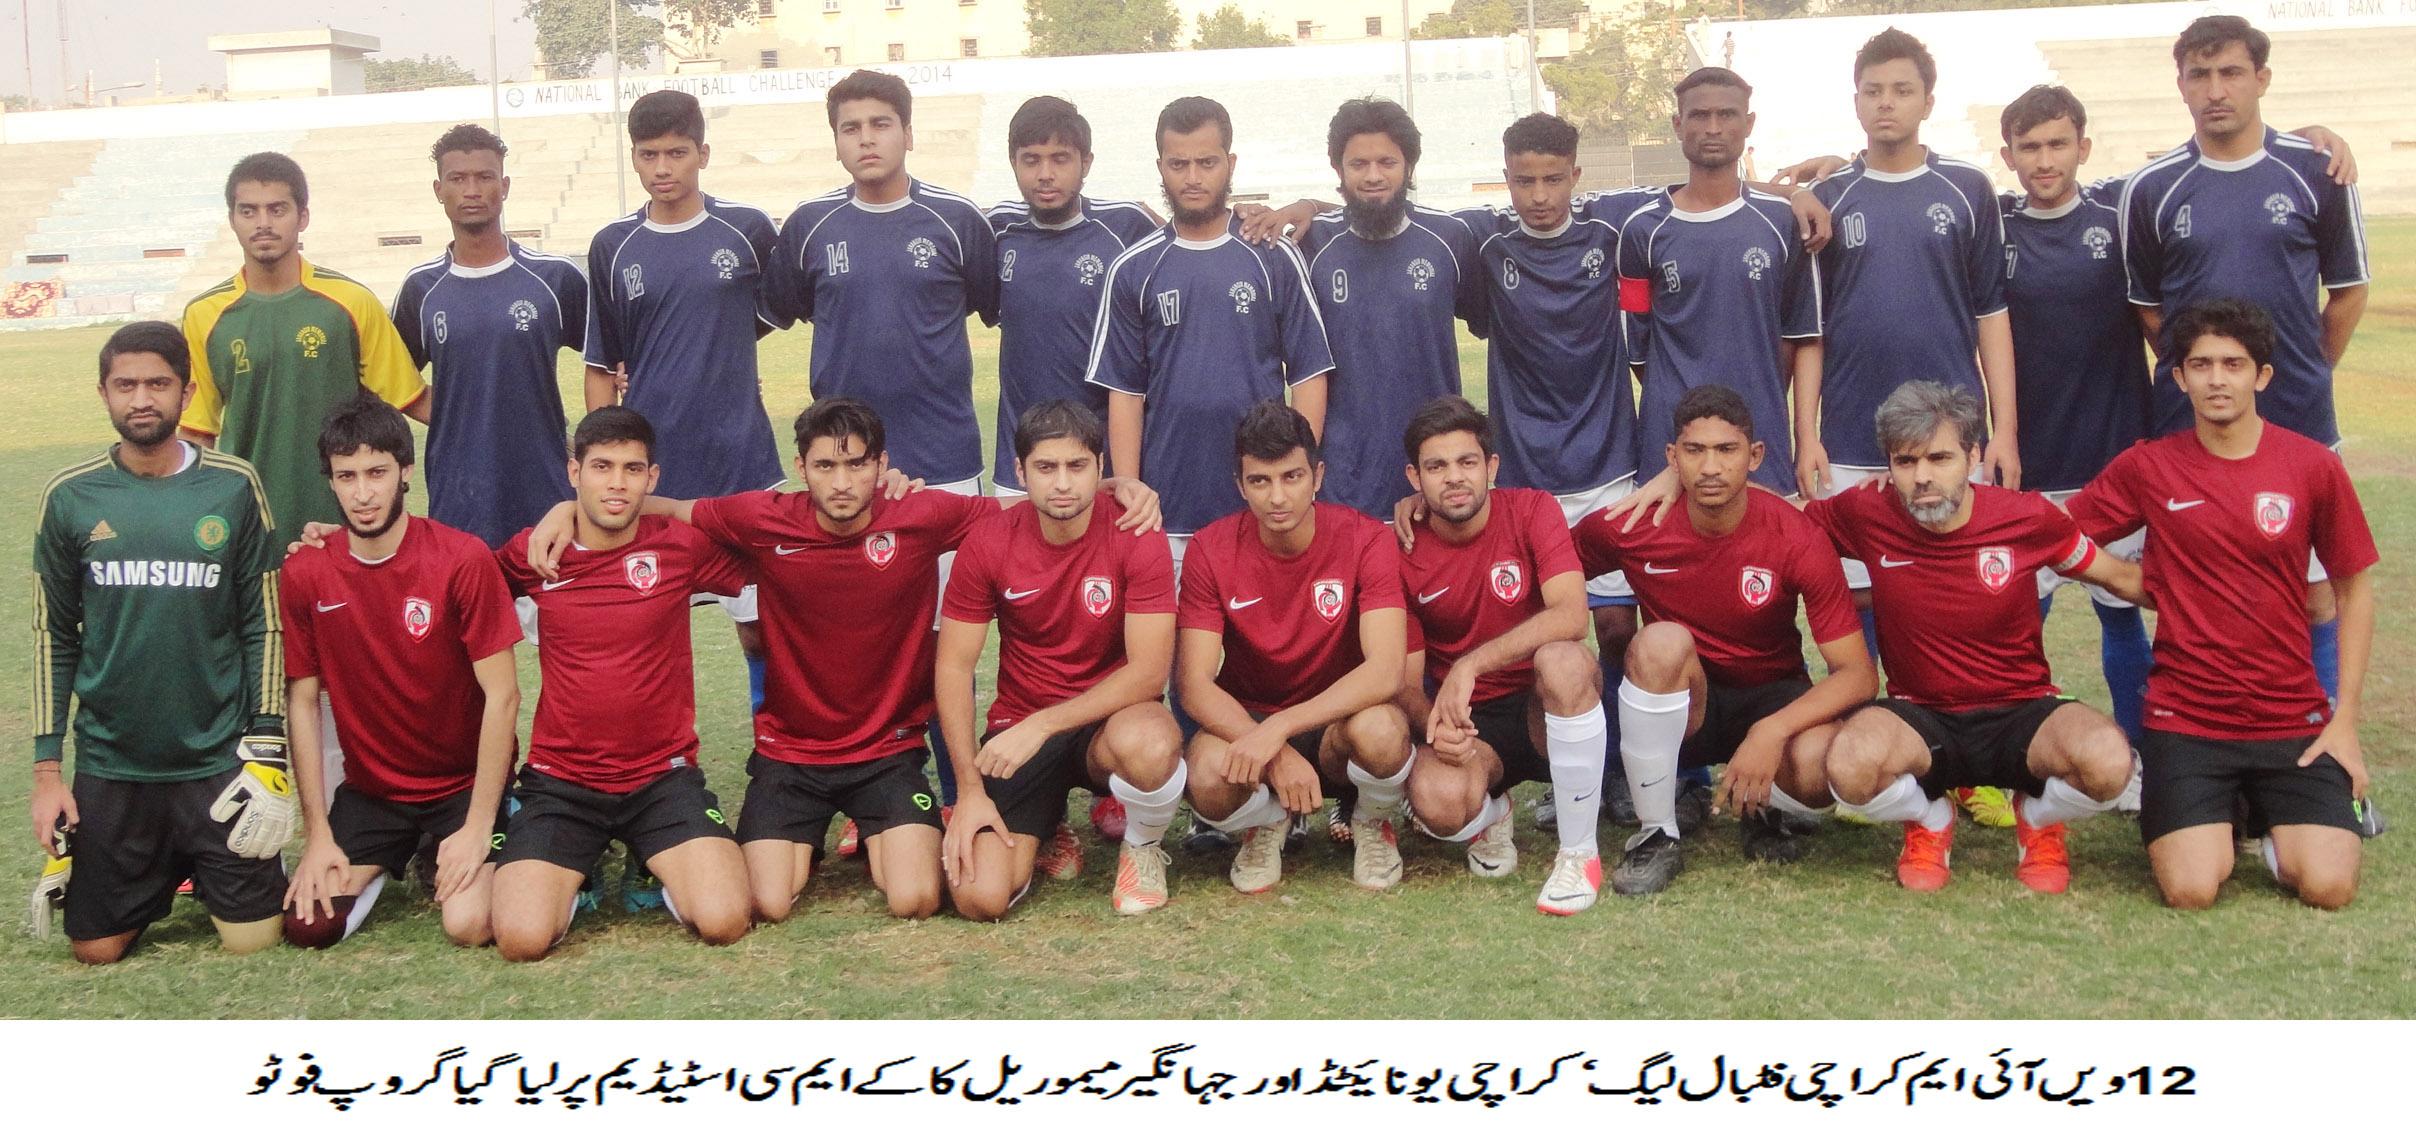 Karachi Football League: KUFC, Musim Brothers secure victories